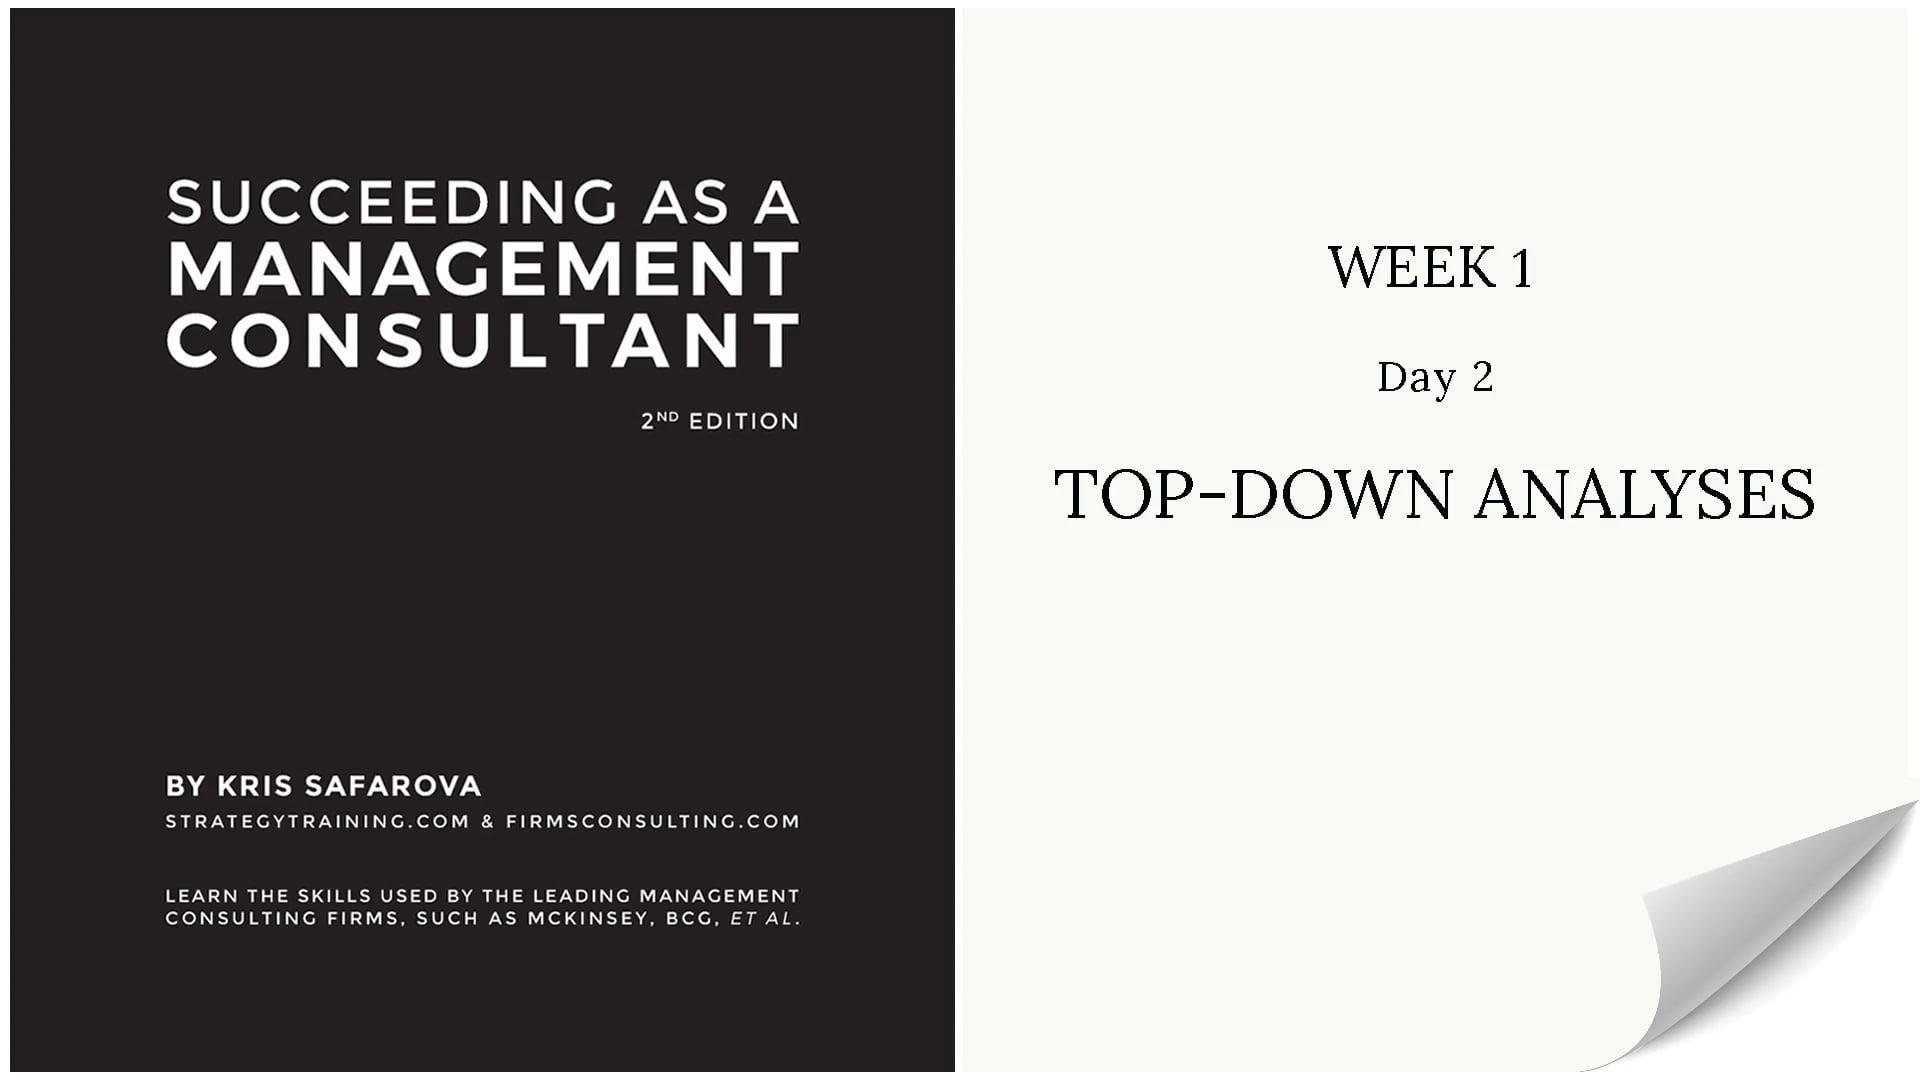 008 SAAMC Week 1 - Day 2 Top-Down Ana...